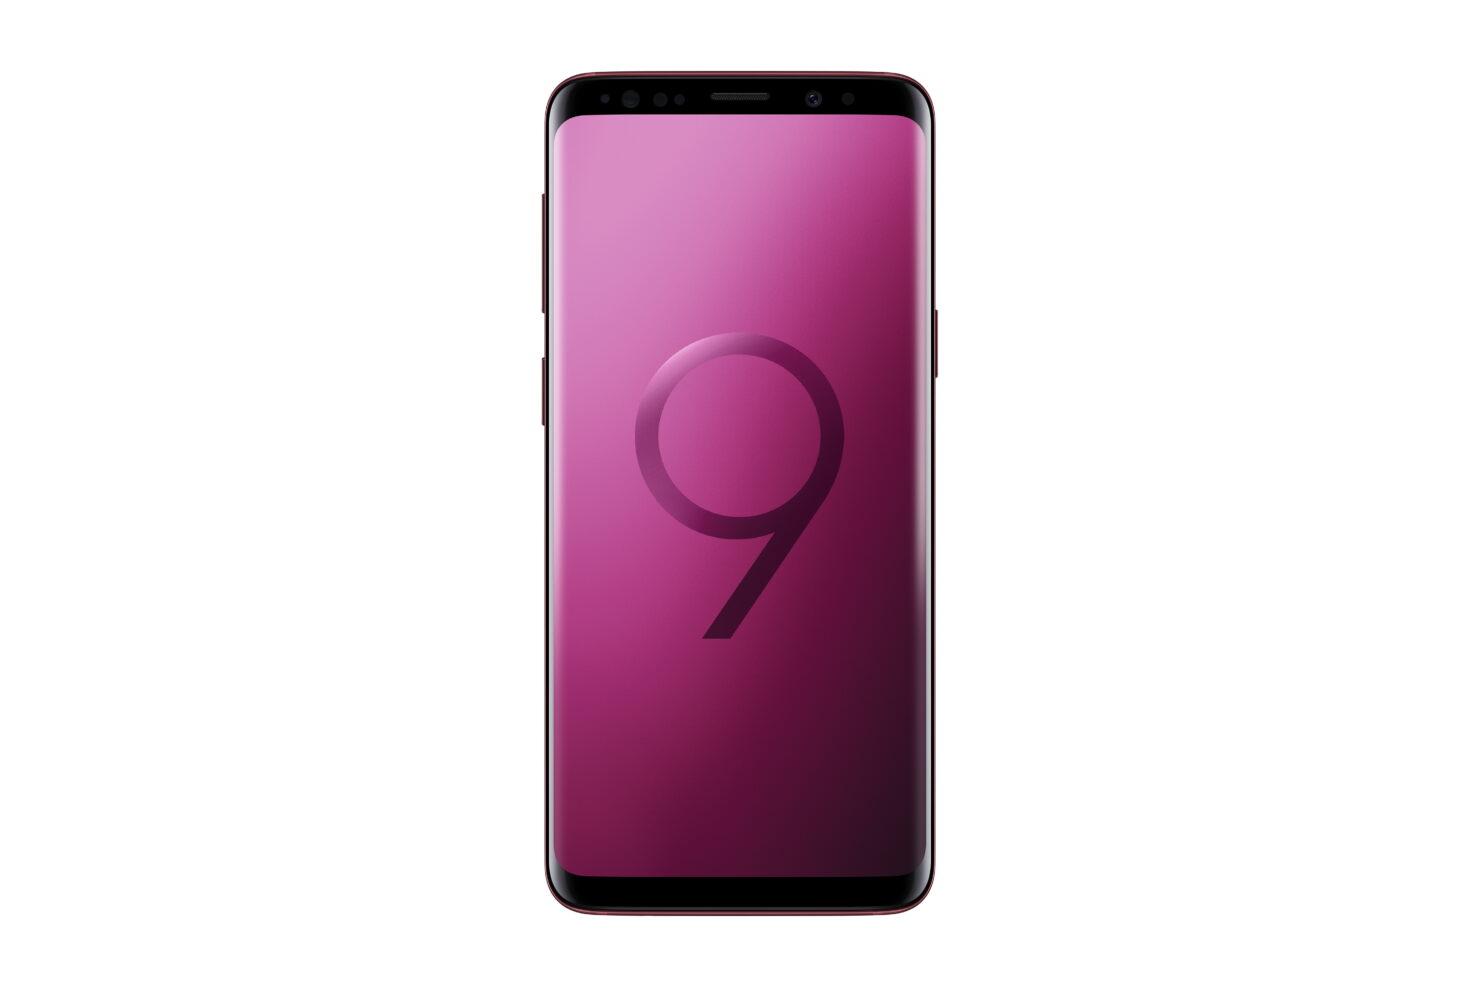 galaxy-s9-burgundy-red_1